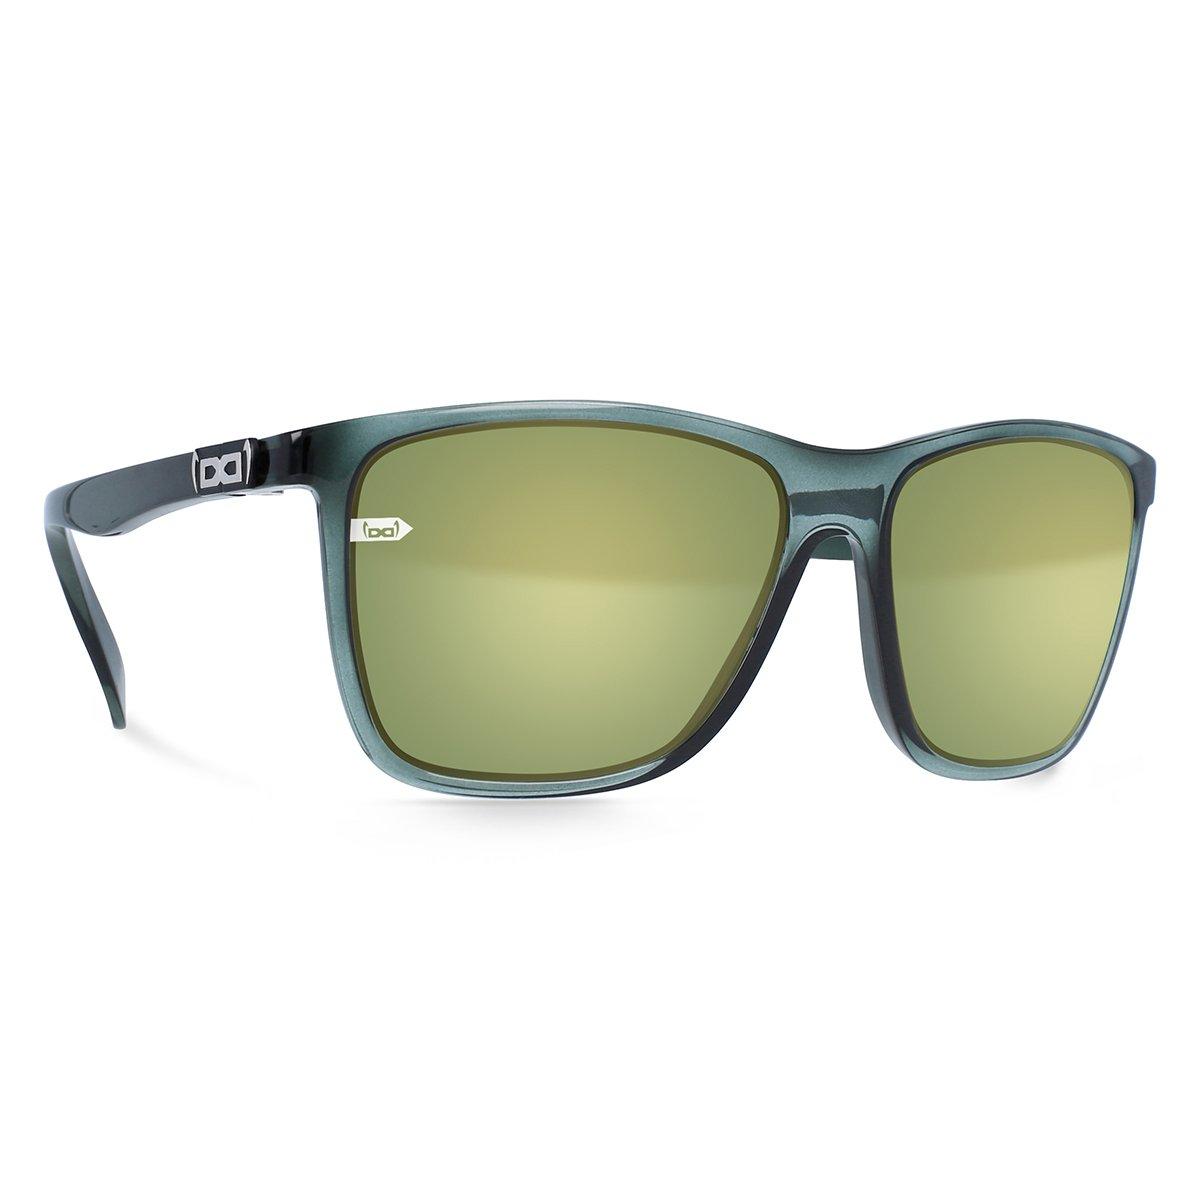 Gloryfy unbreakable eyewear Sonnenbrille Gi15 St. Pauli Vintage Grün, grün